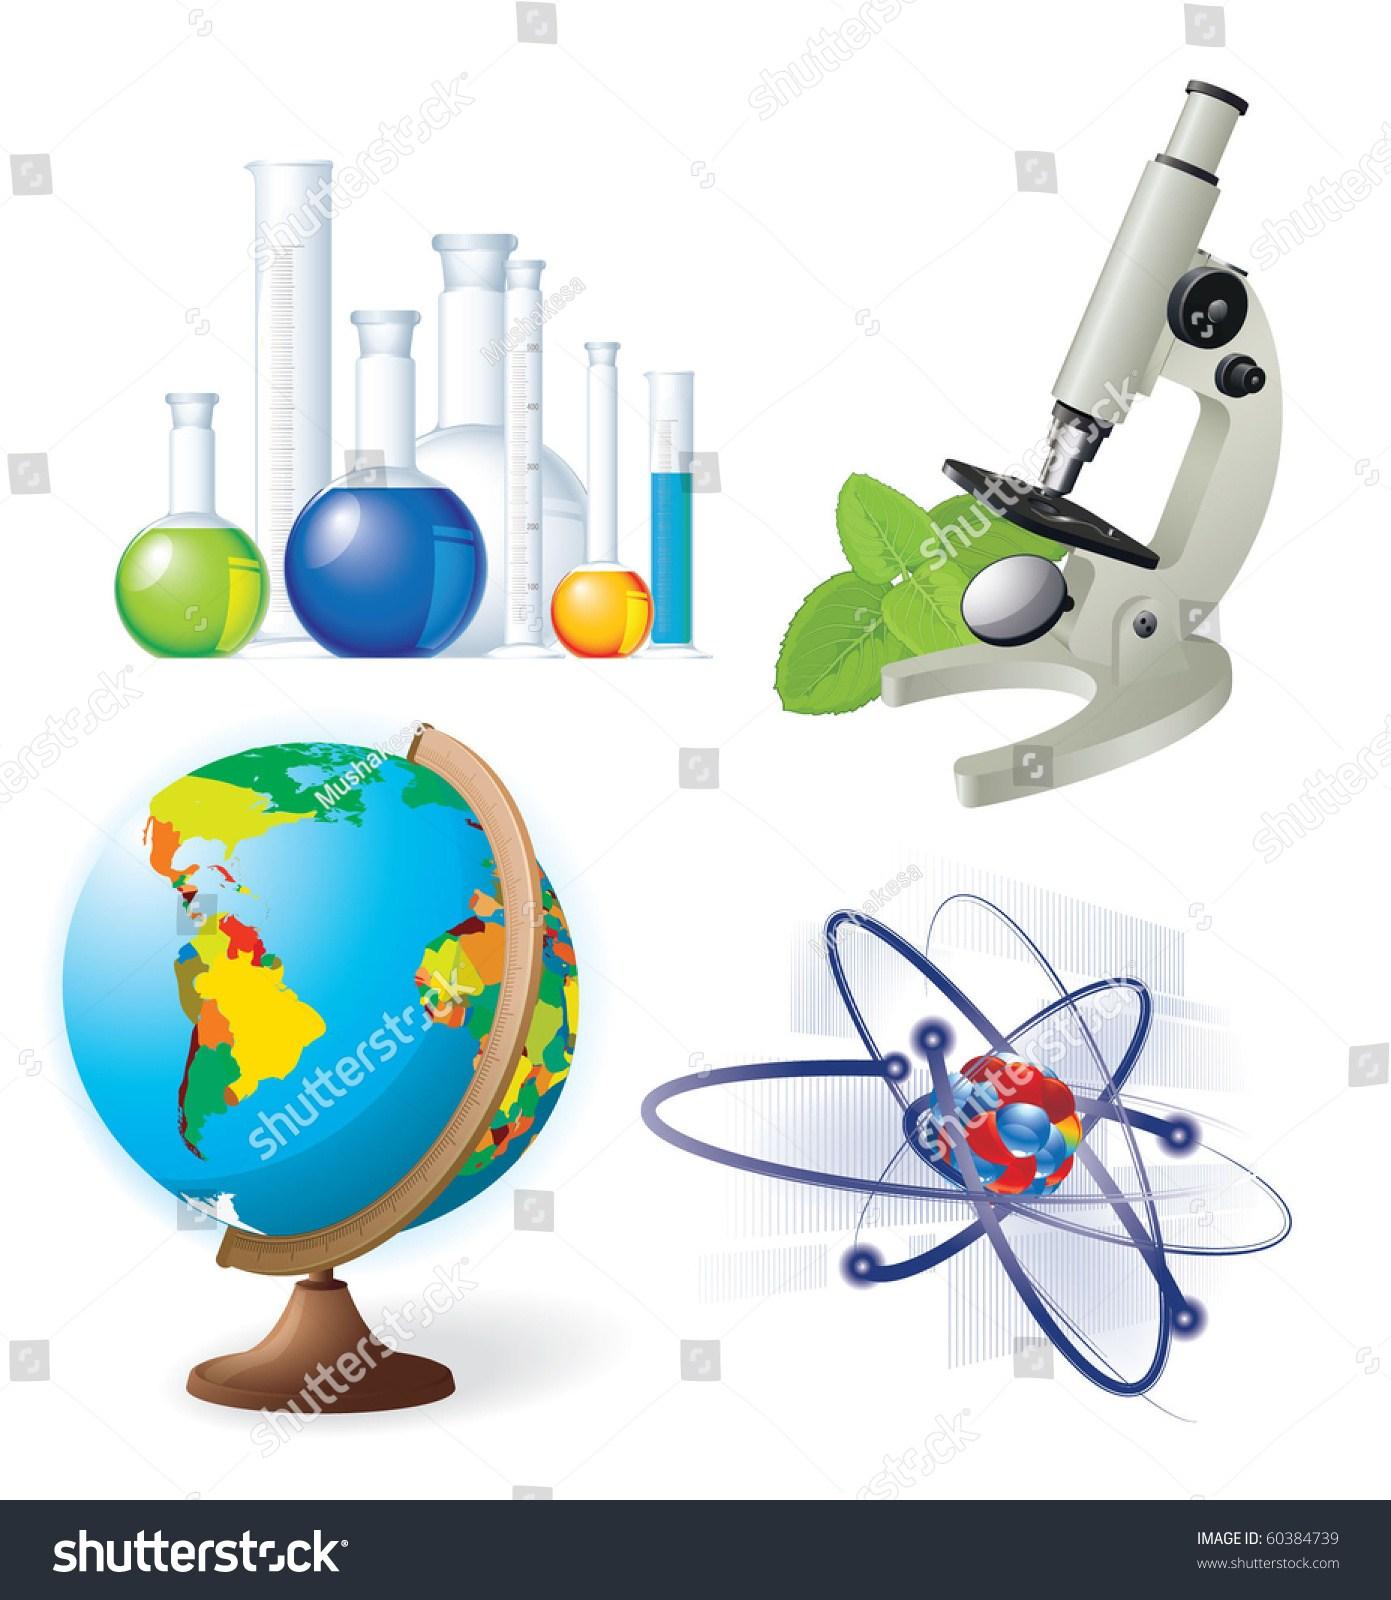 Sciences portal . Technology clipart natural science